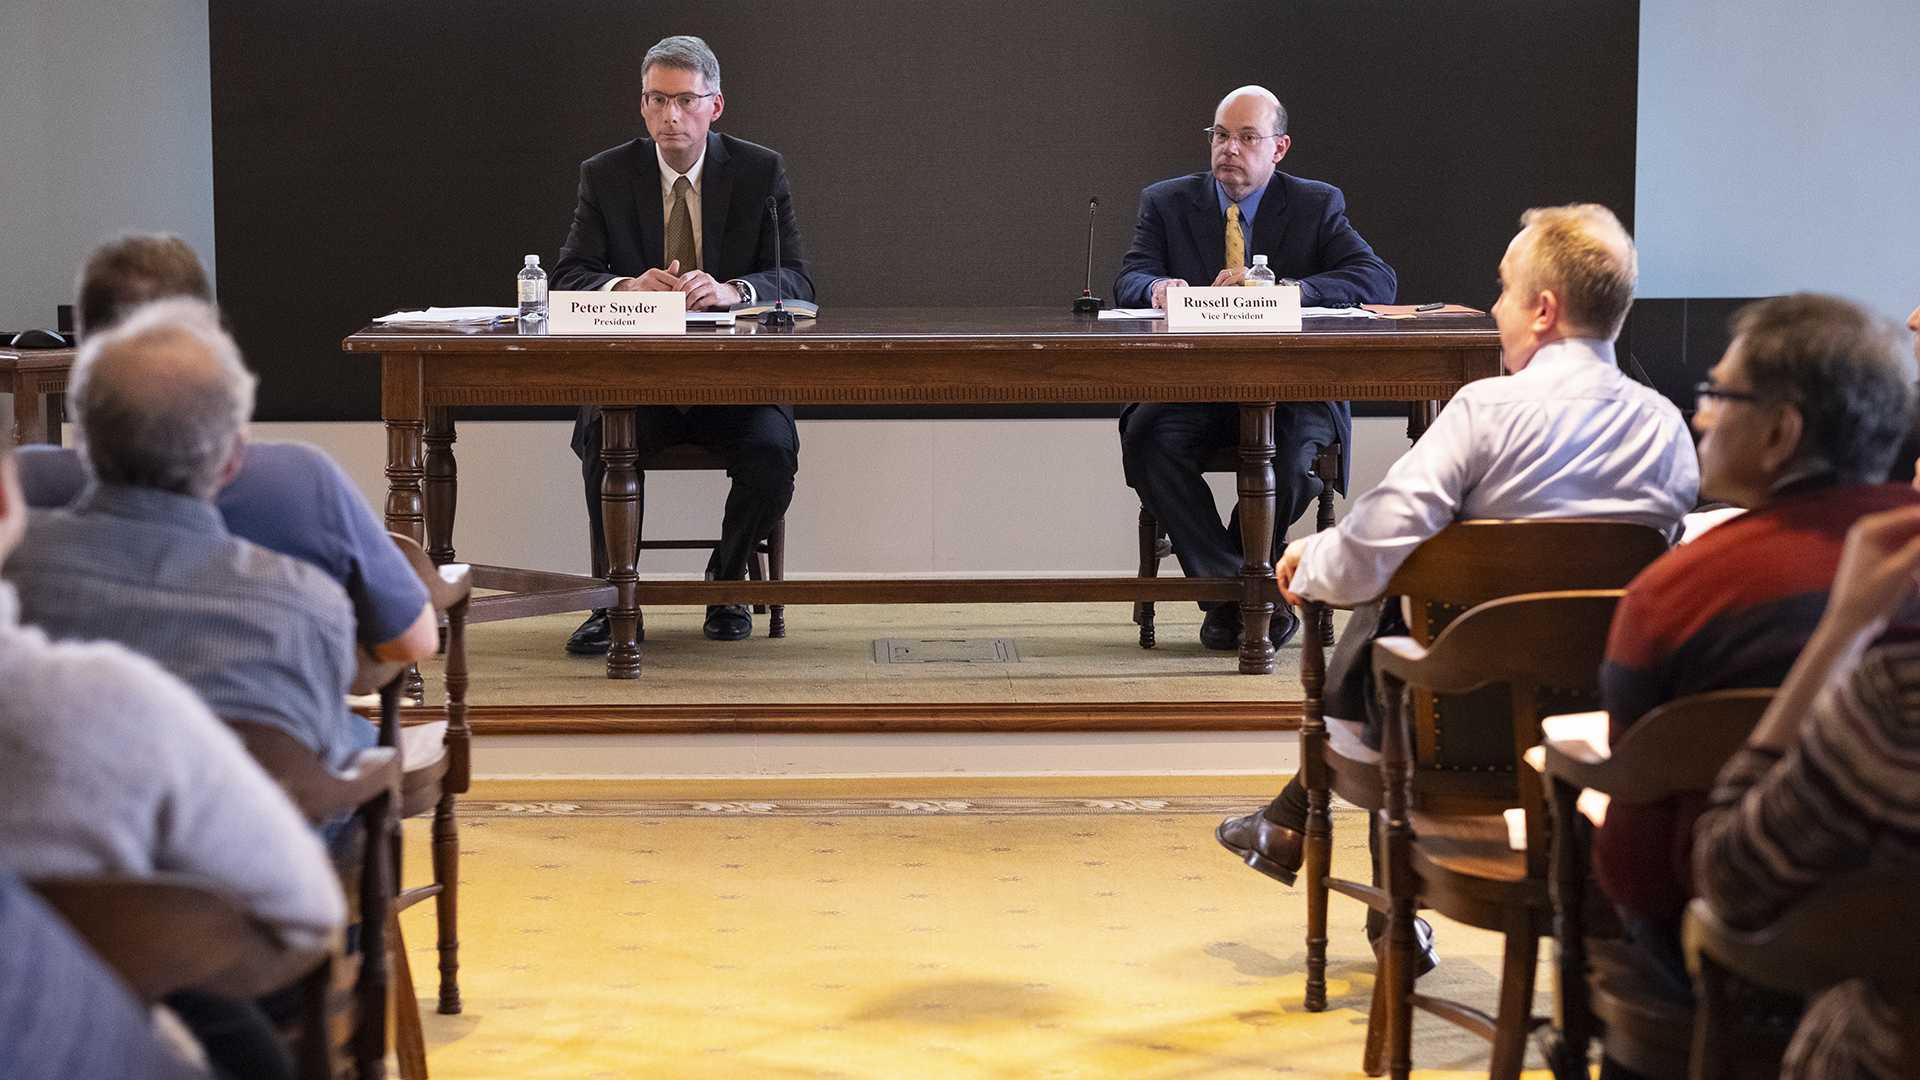 UI Faculty Senate elects new leadership